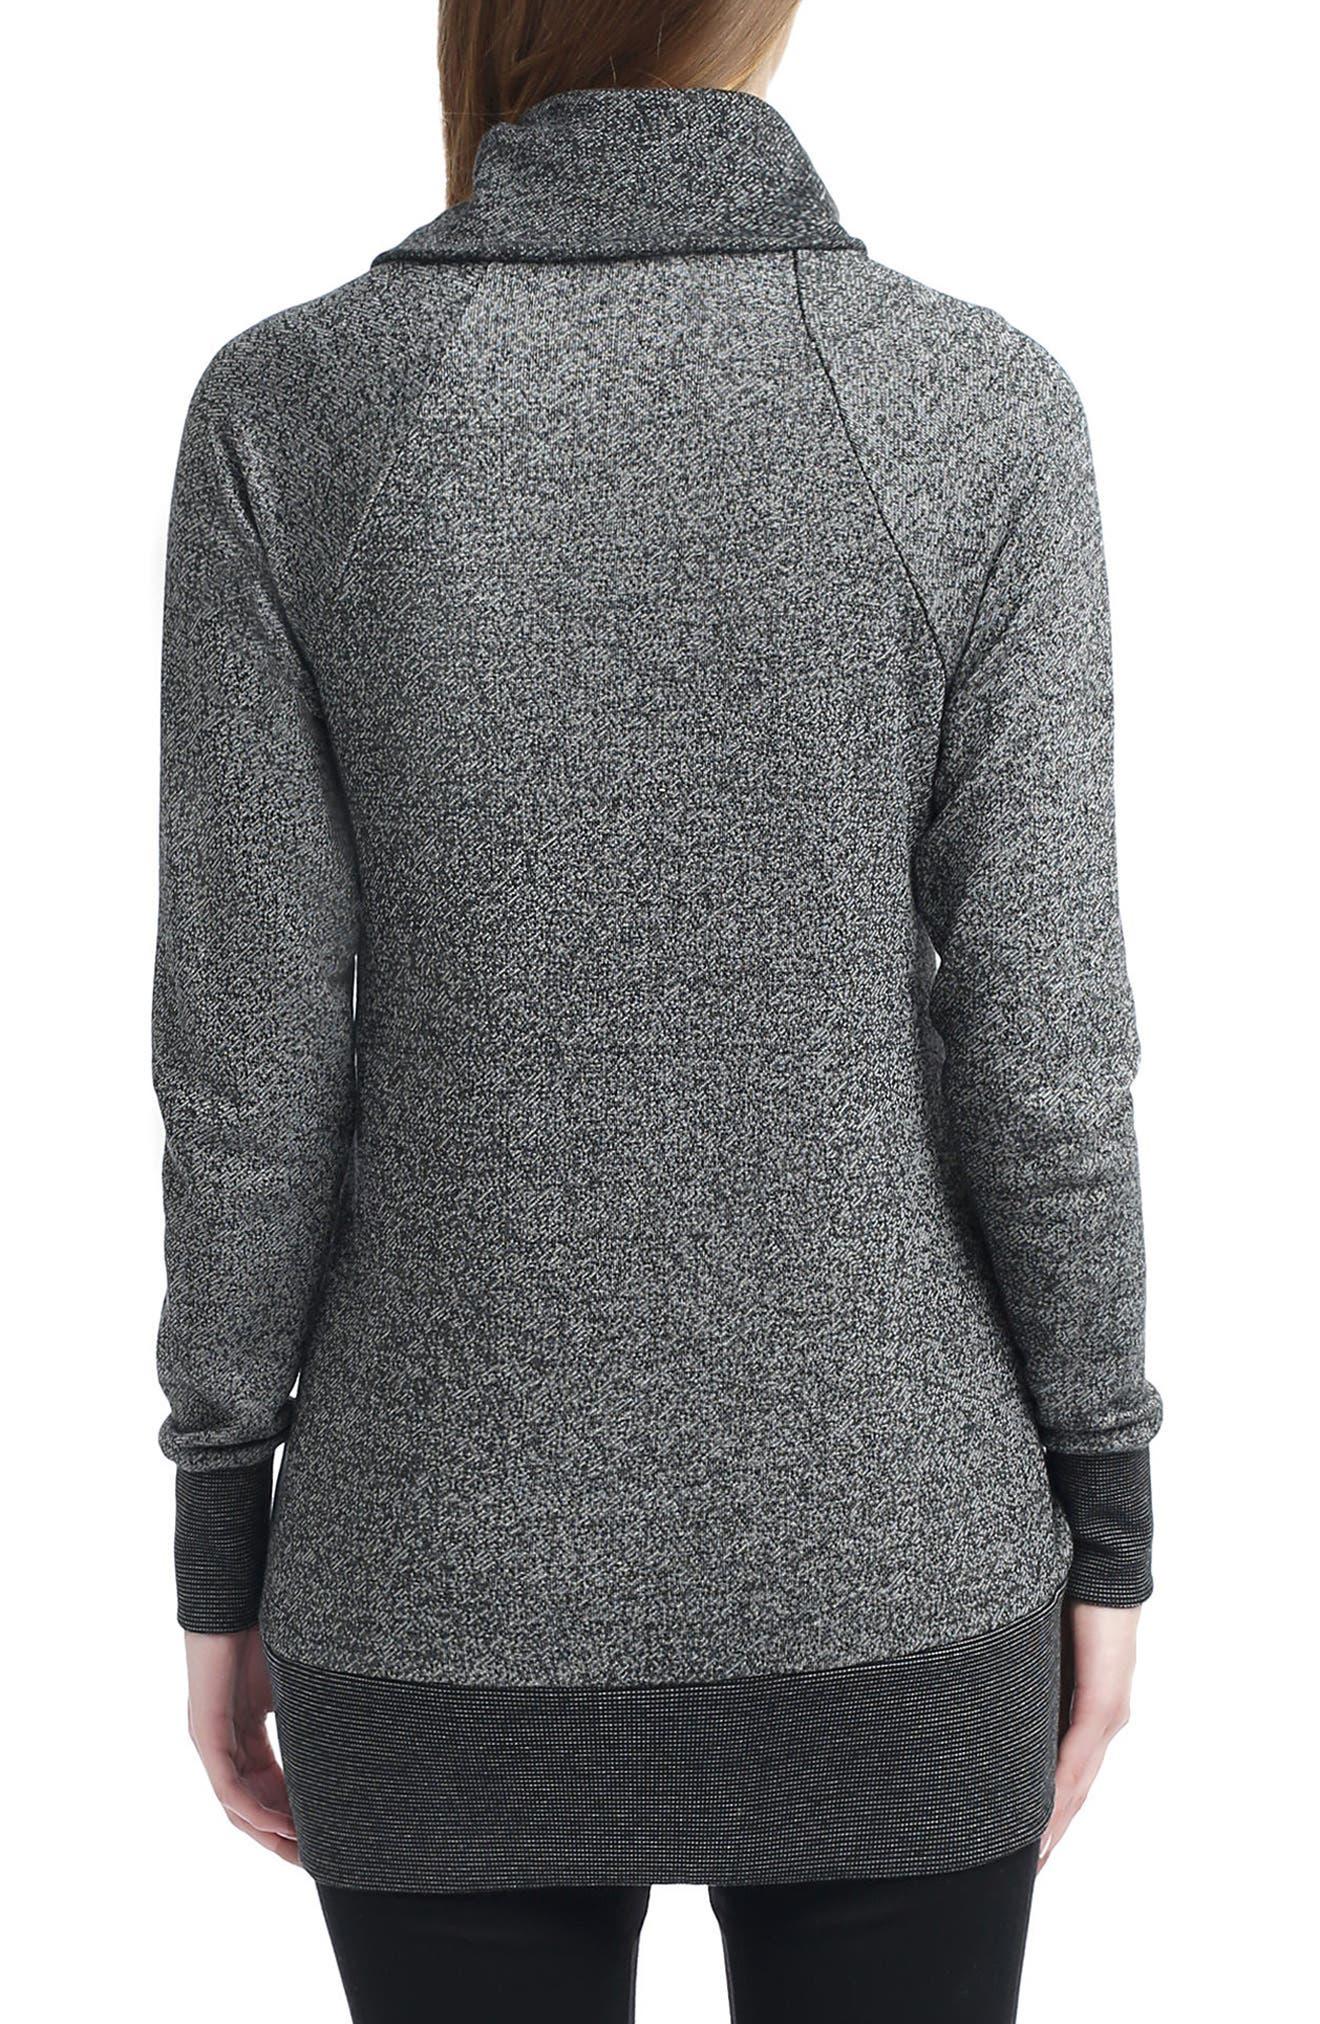 Alaina Envelope Collar Sweater,                             Alternate thumbnail 2, color,                             BLACK/ GRAY